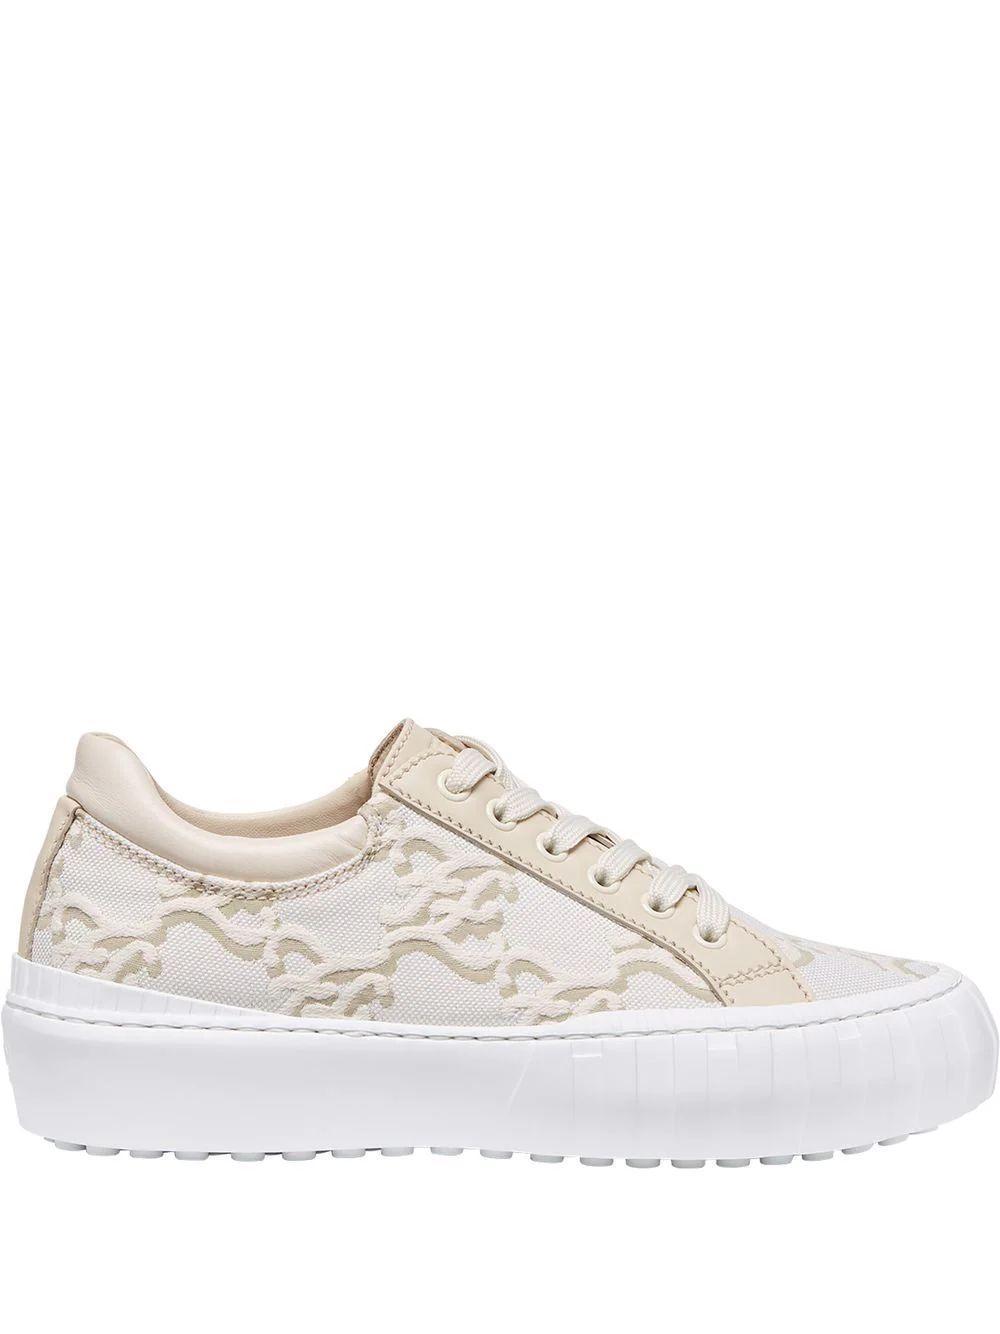 Ff Karligraphy Sneakers Item # 8E8214-AGEK